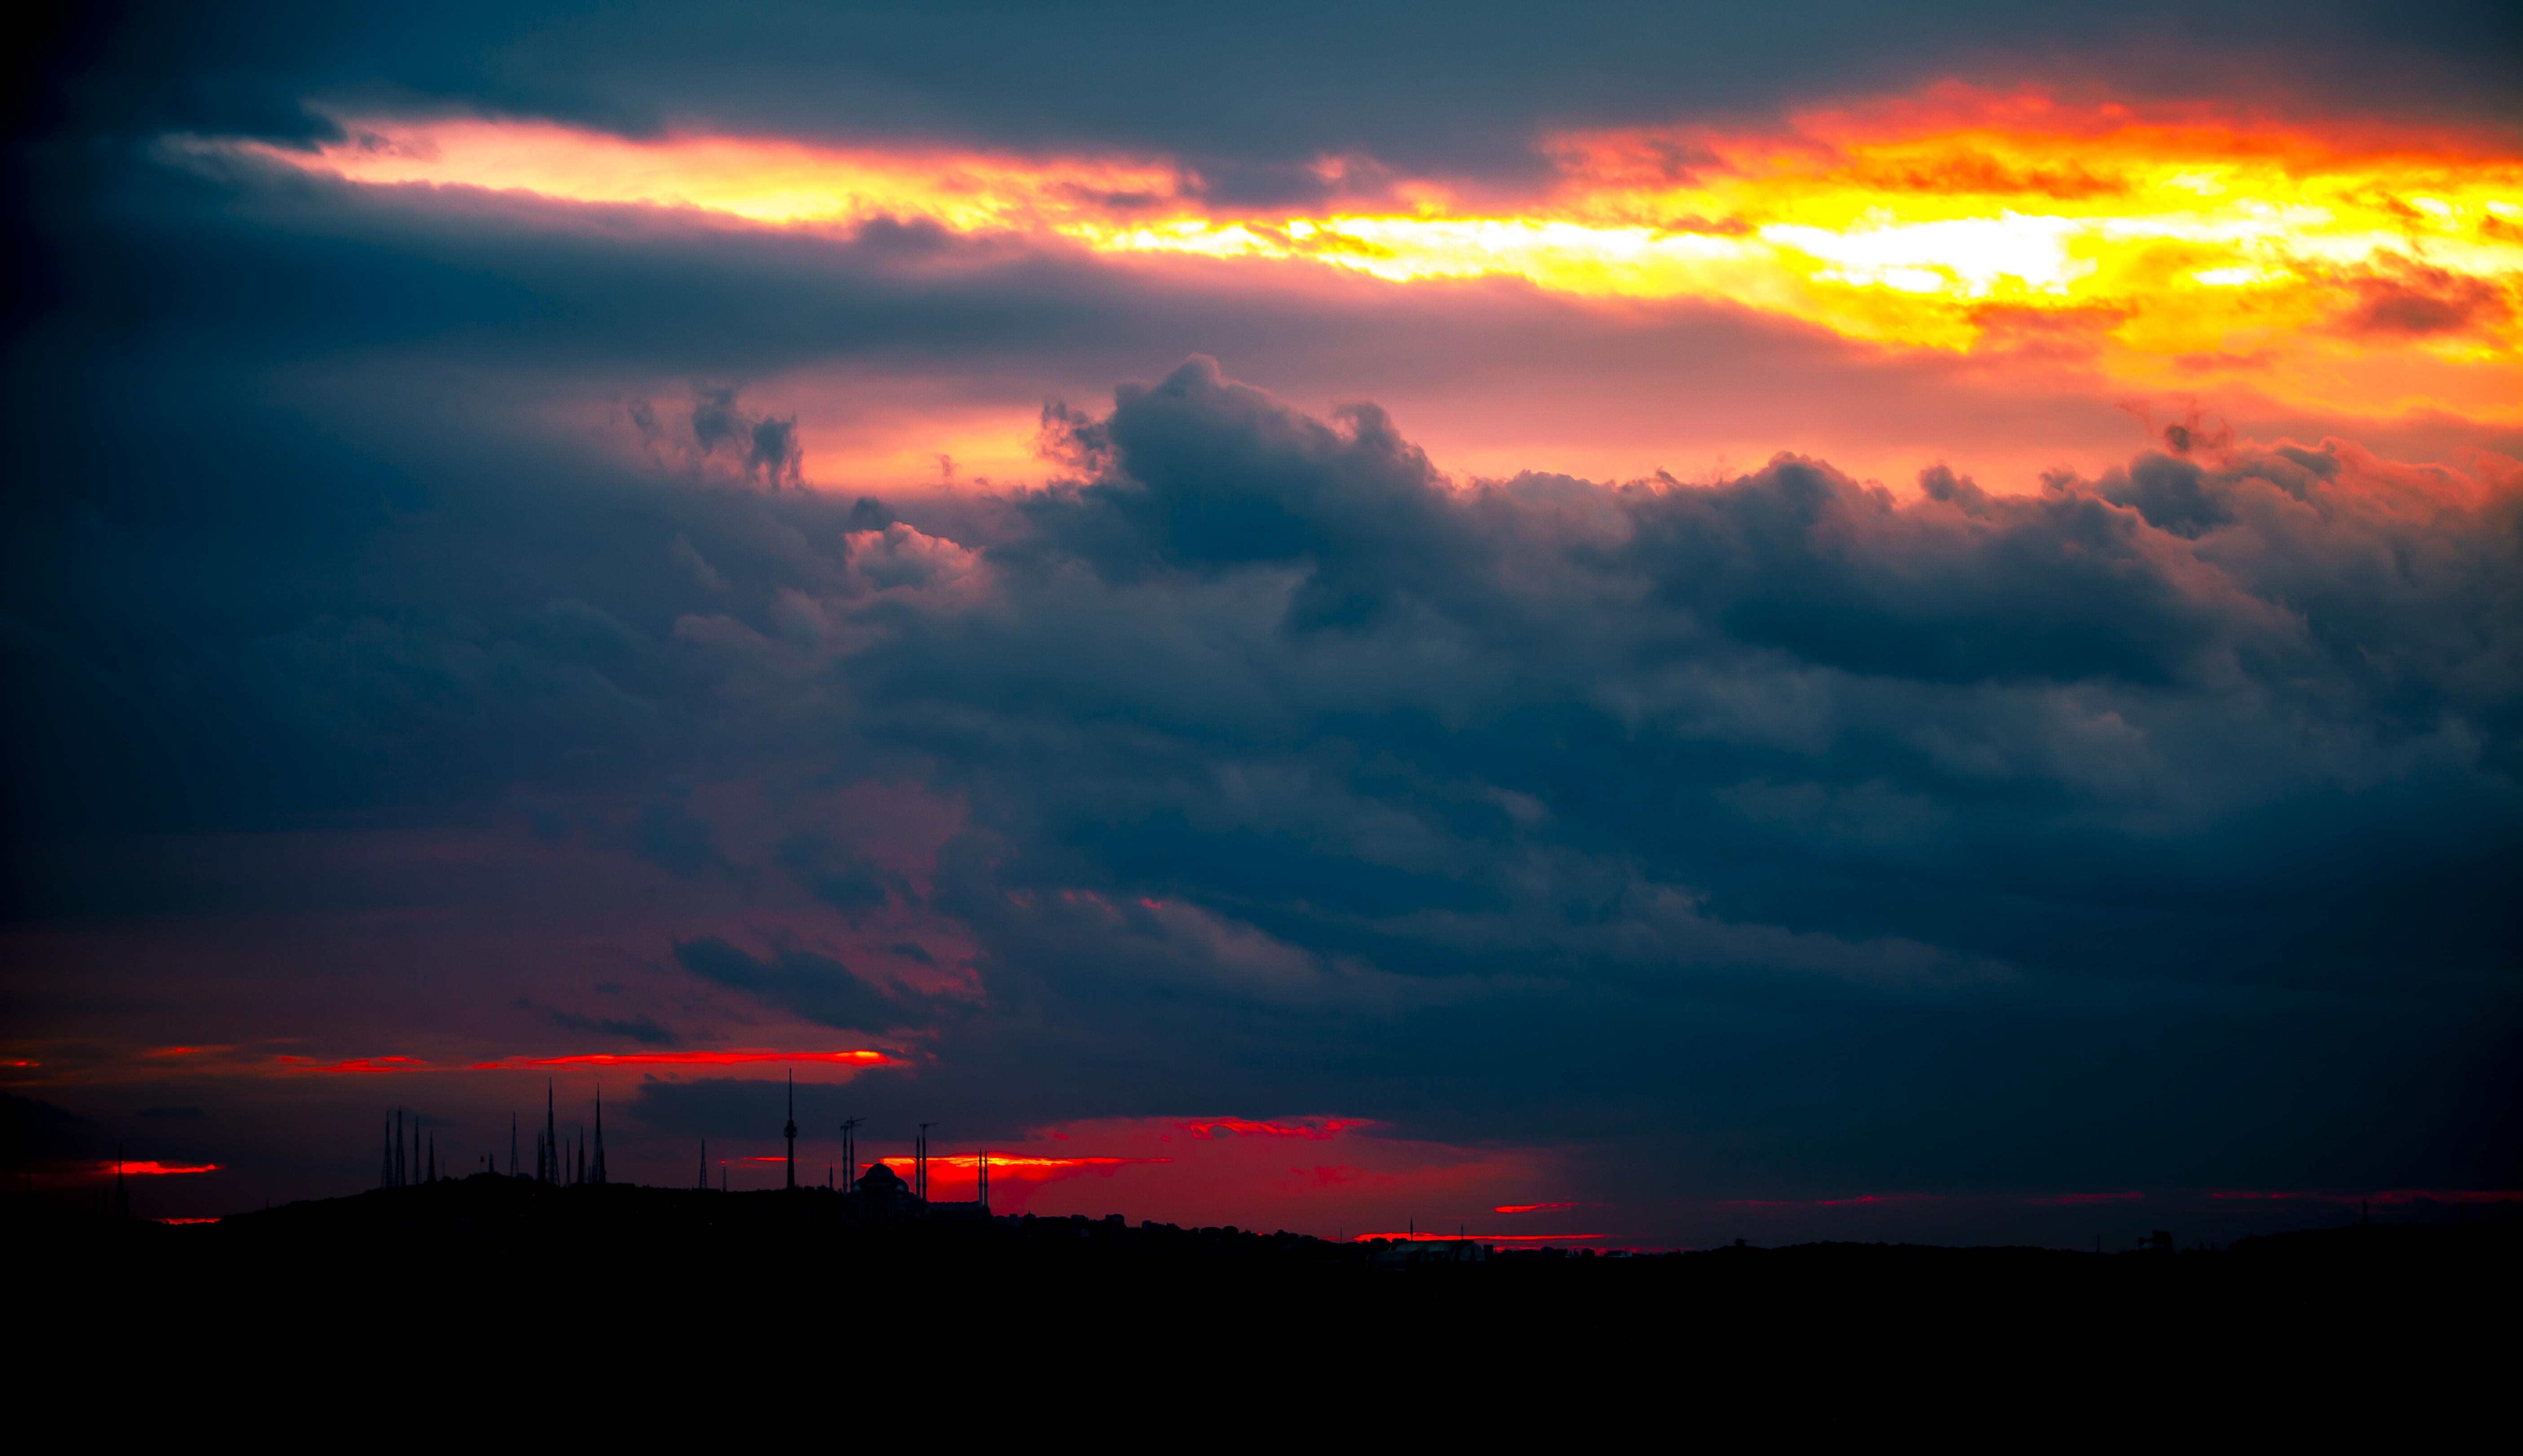 Lock Screen Wallpaper Iphone 7 1000 Great Sunset Background Photos 183 Pexels 183 Free Stock